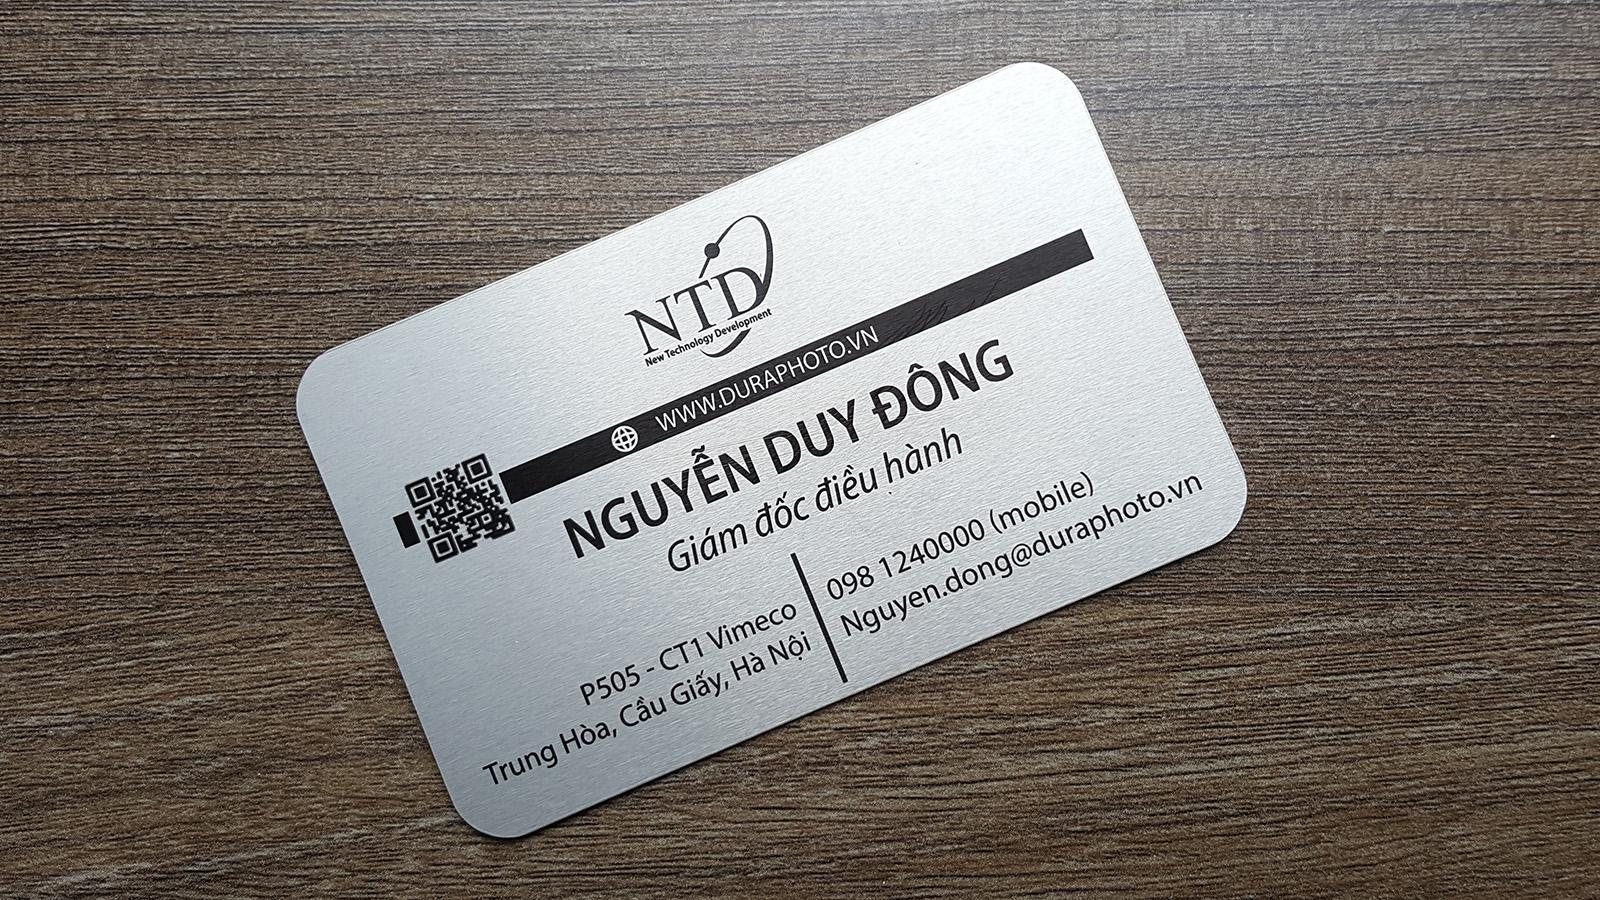 in name card gap lay ngay tai hcm-2